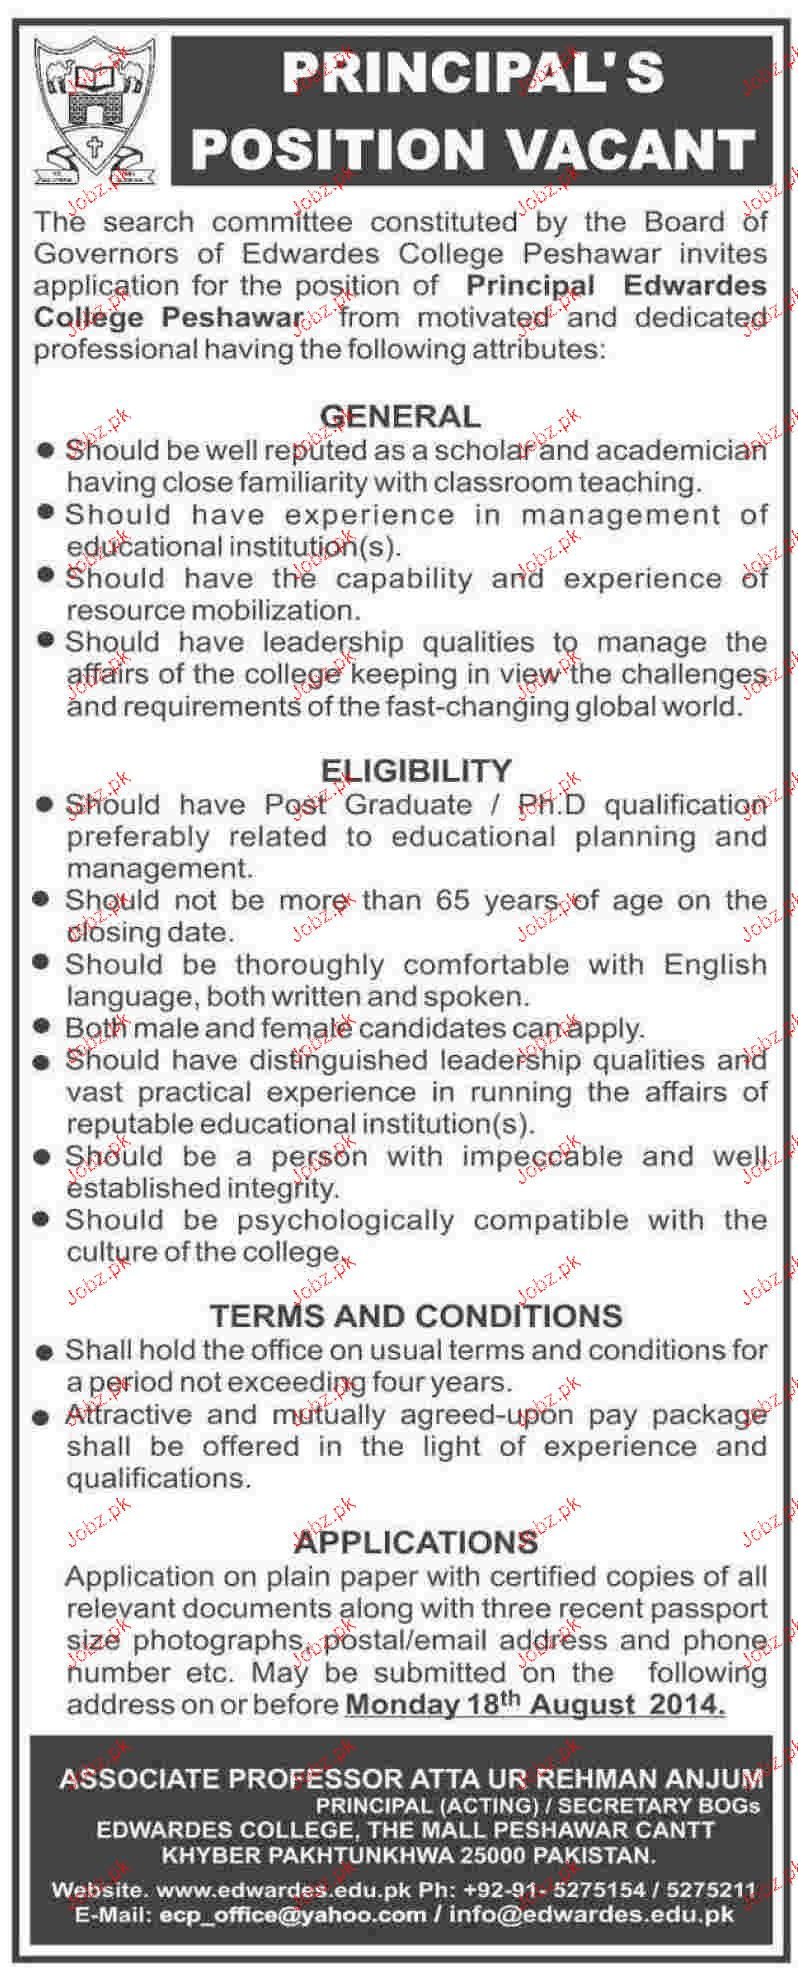 Principal Job in Edwardes College Peshawar